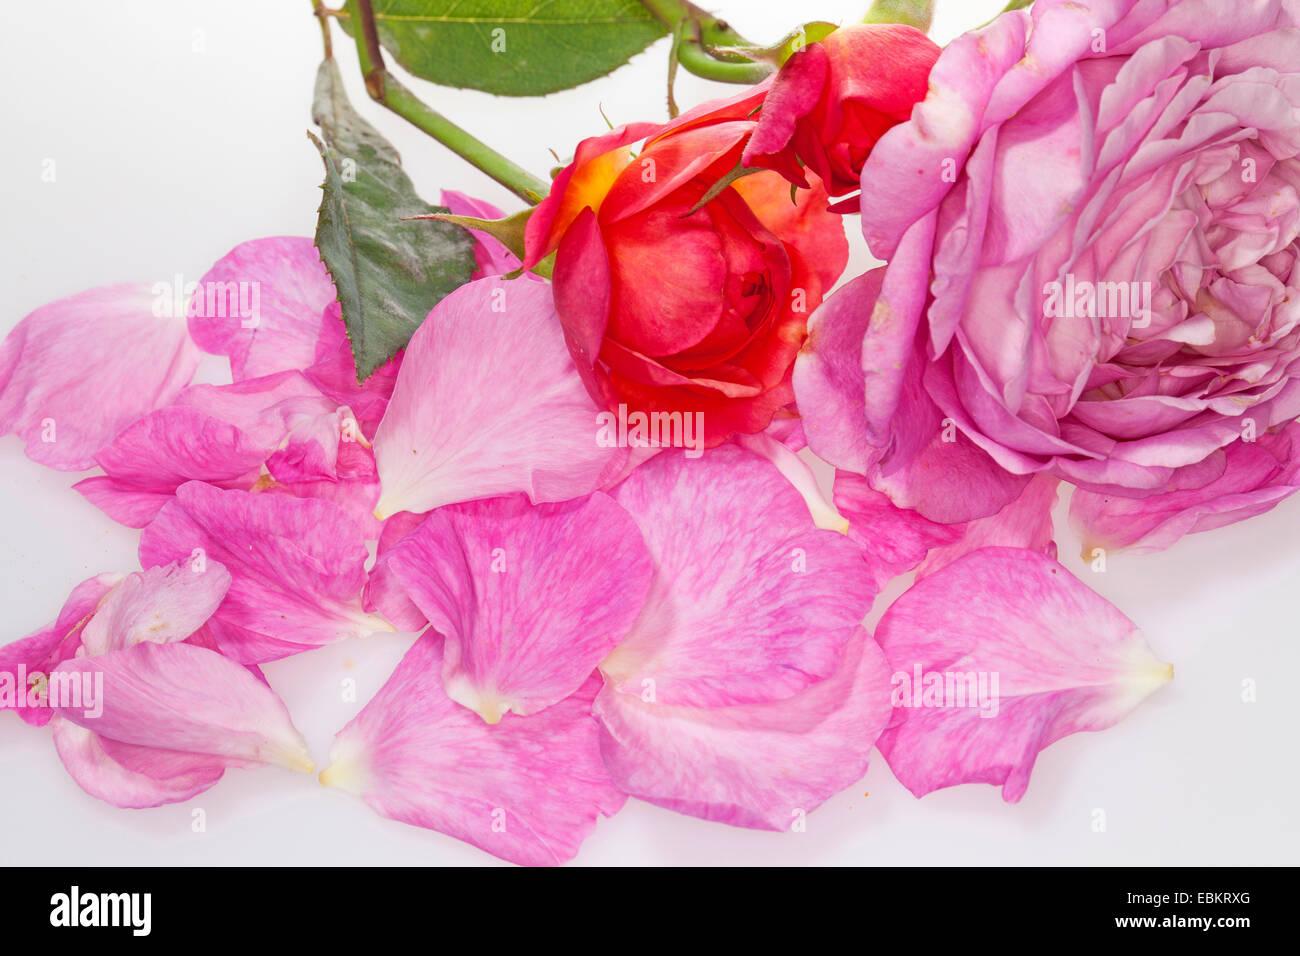 dekorative Rose (Rosa spec.), Blütenblätter einer rose Stockbild